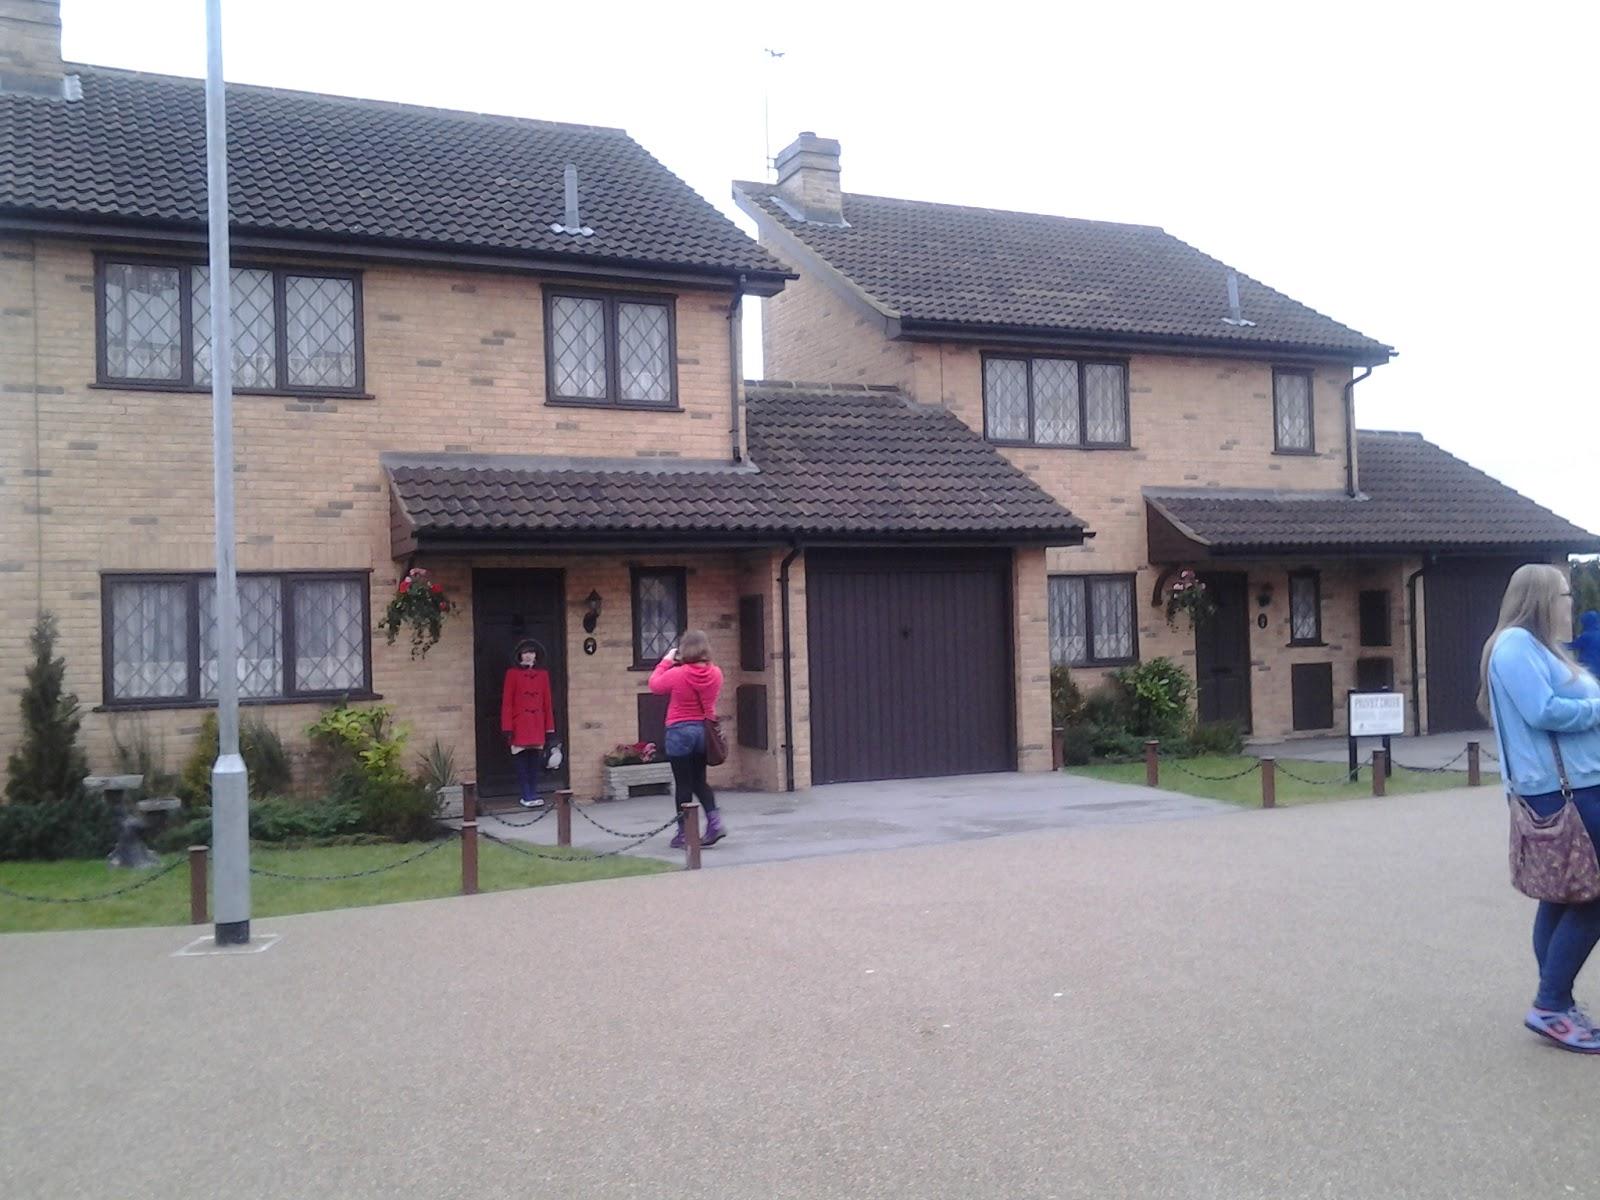 England 2012/13: Harry Potter Studios Teil 2